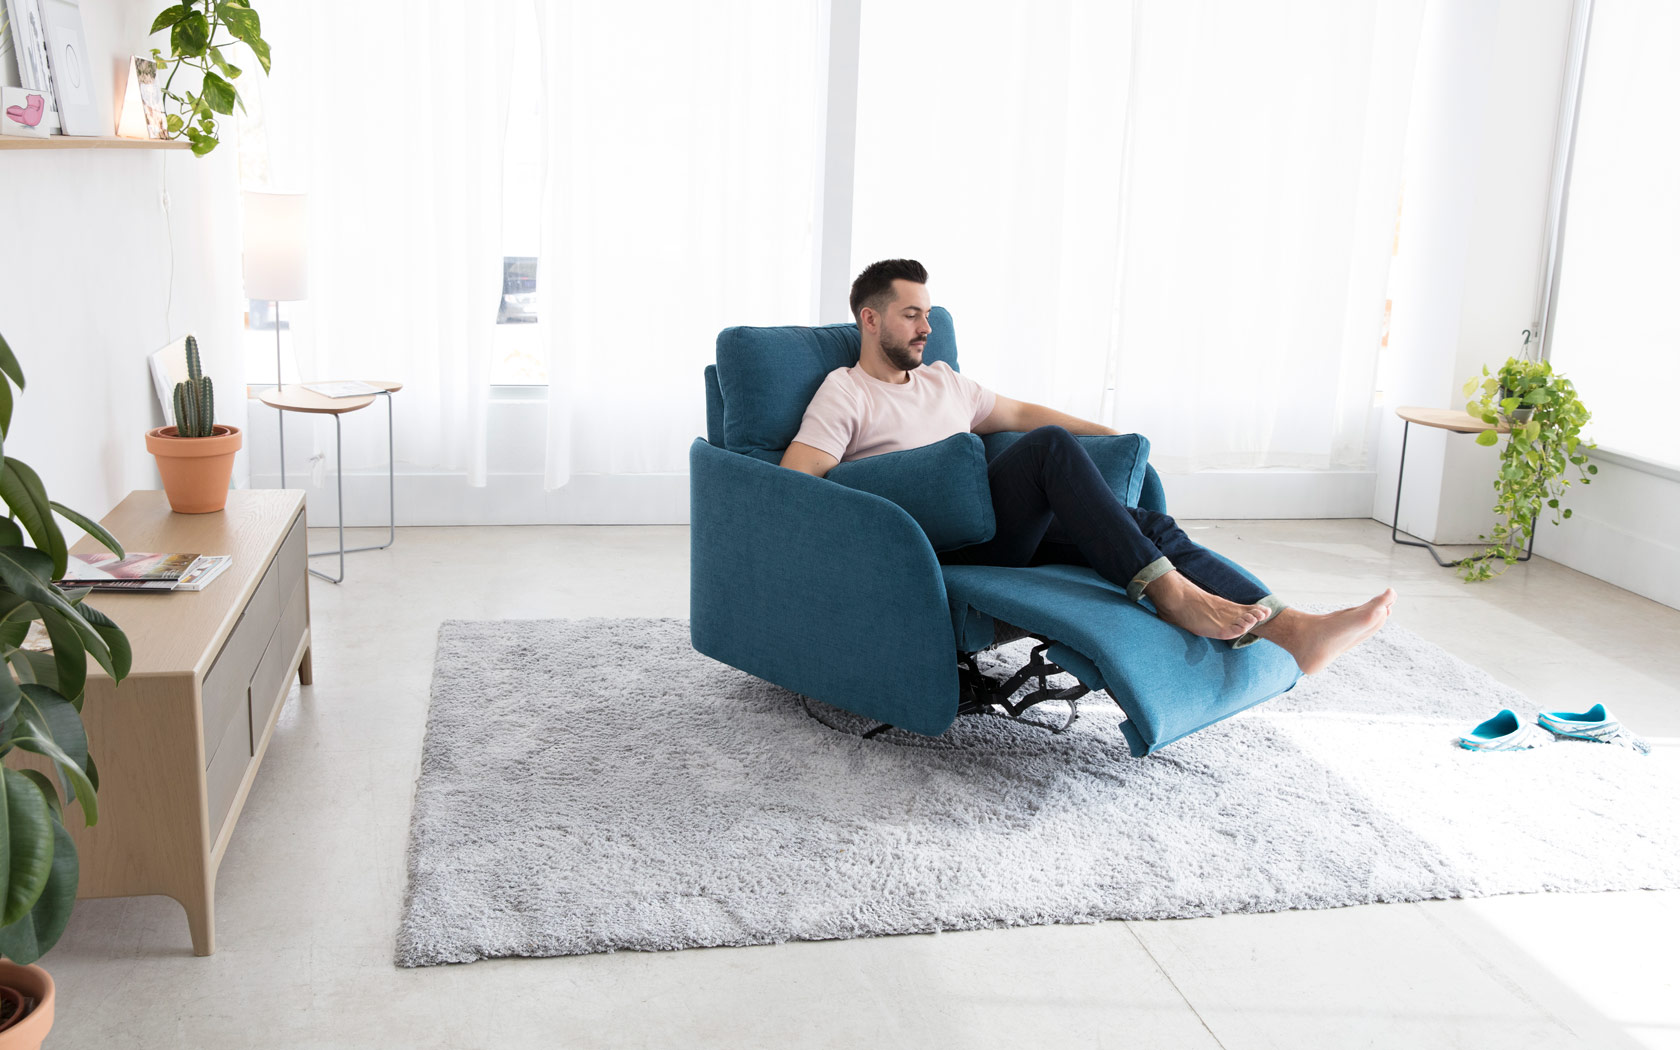 Adan sillon relax 2020 06